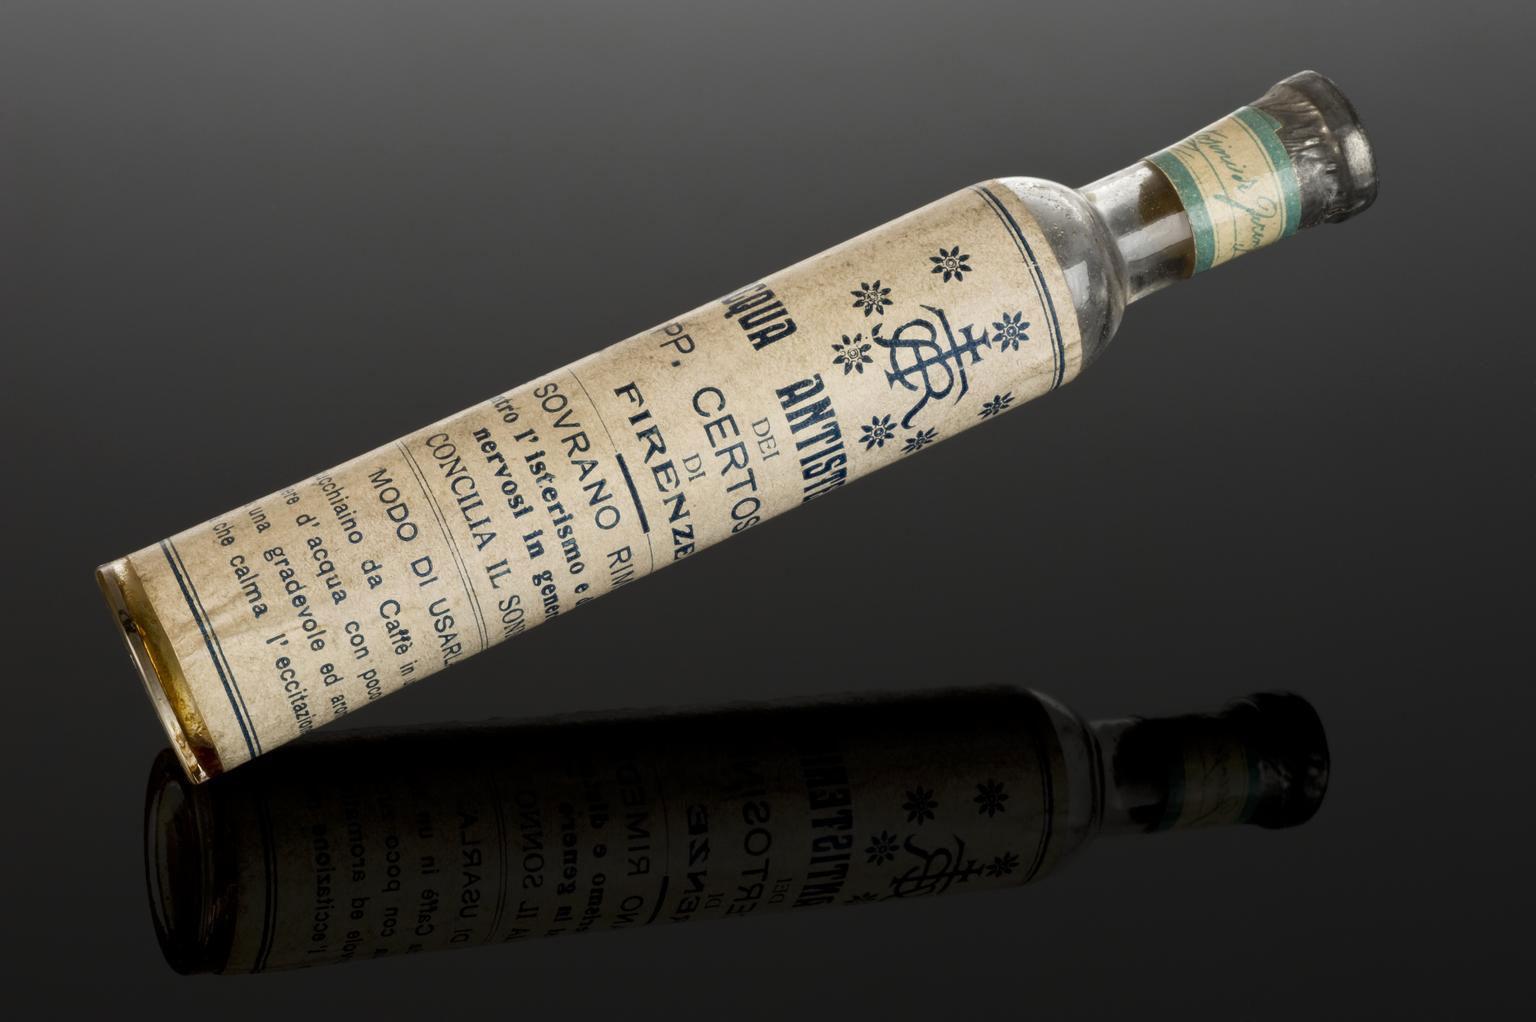 photograph of long thin bottle containing orange liquid, the bottle has a cream paper label